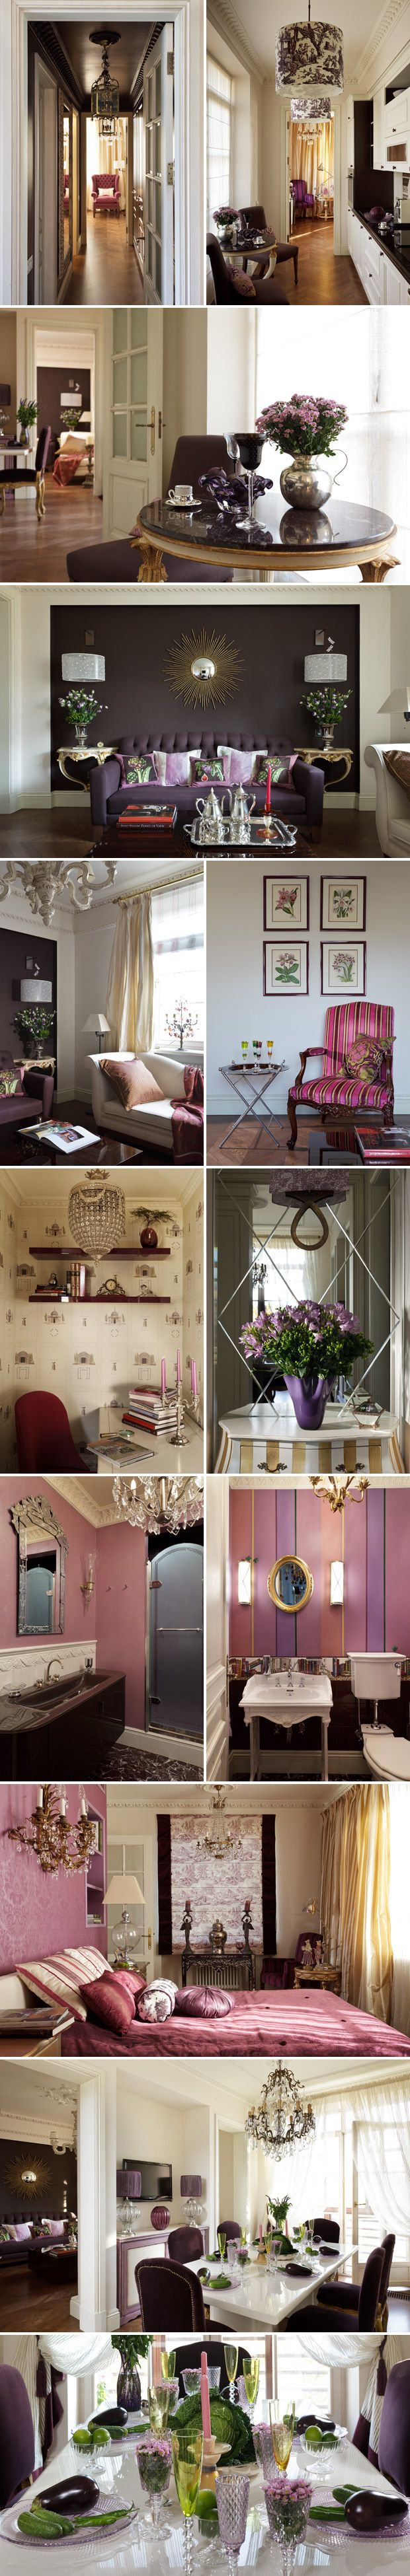 Парижский шик | Westwing интерьер & дизайн